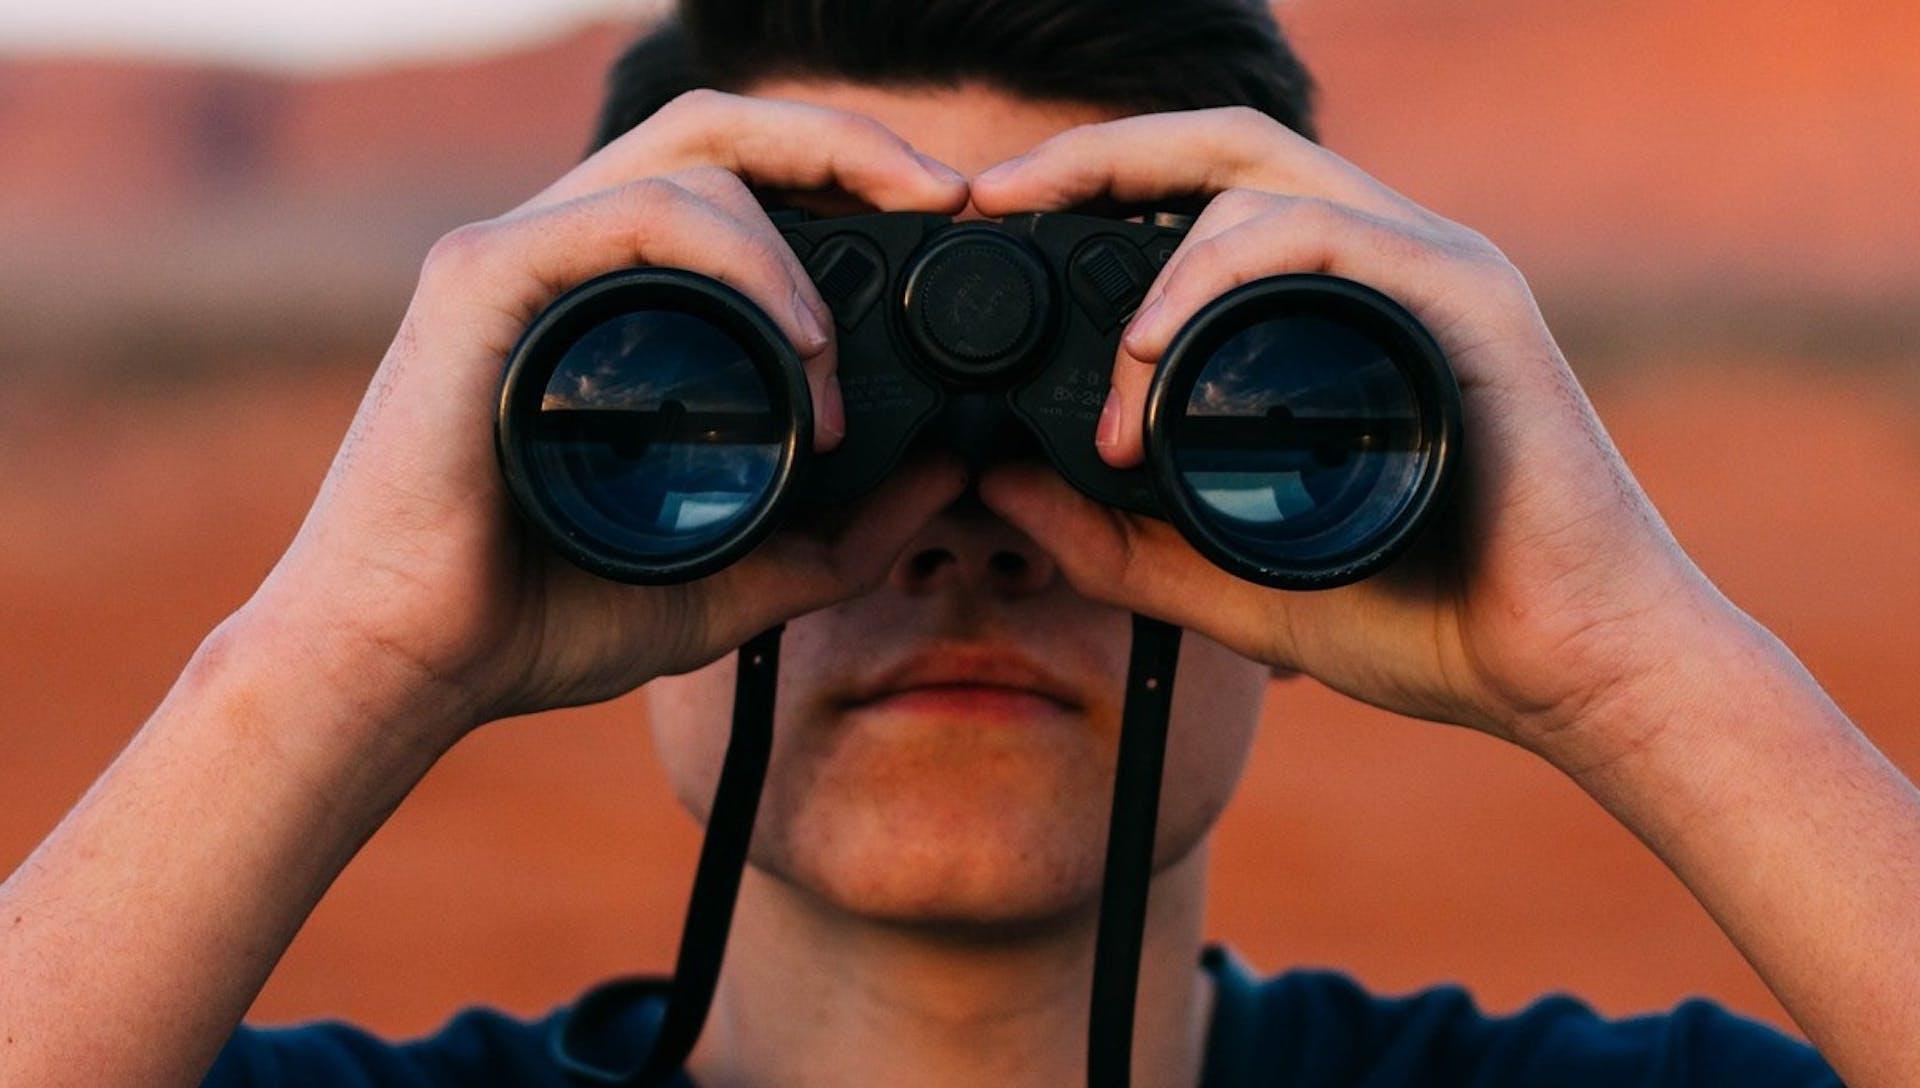 ¿Qué es un insight?: Descubre verdades ocultas de tu consumidor